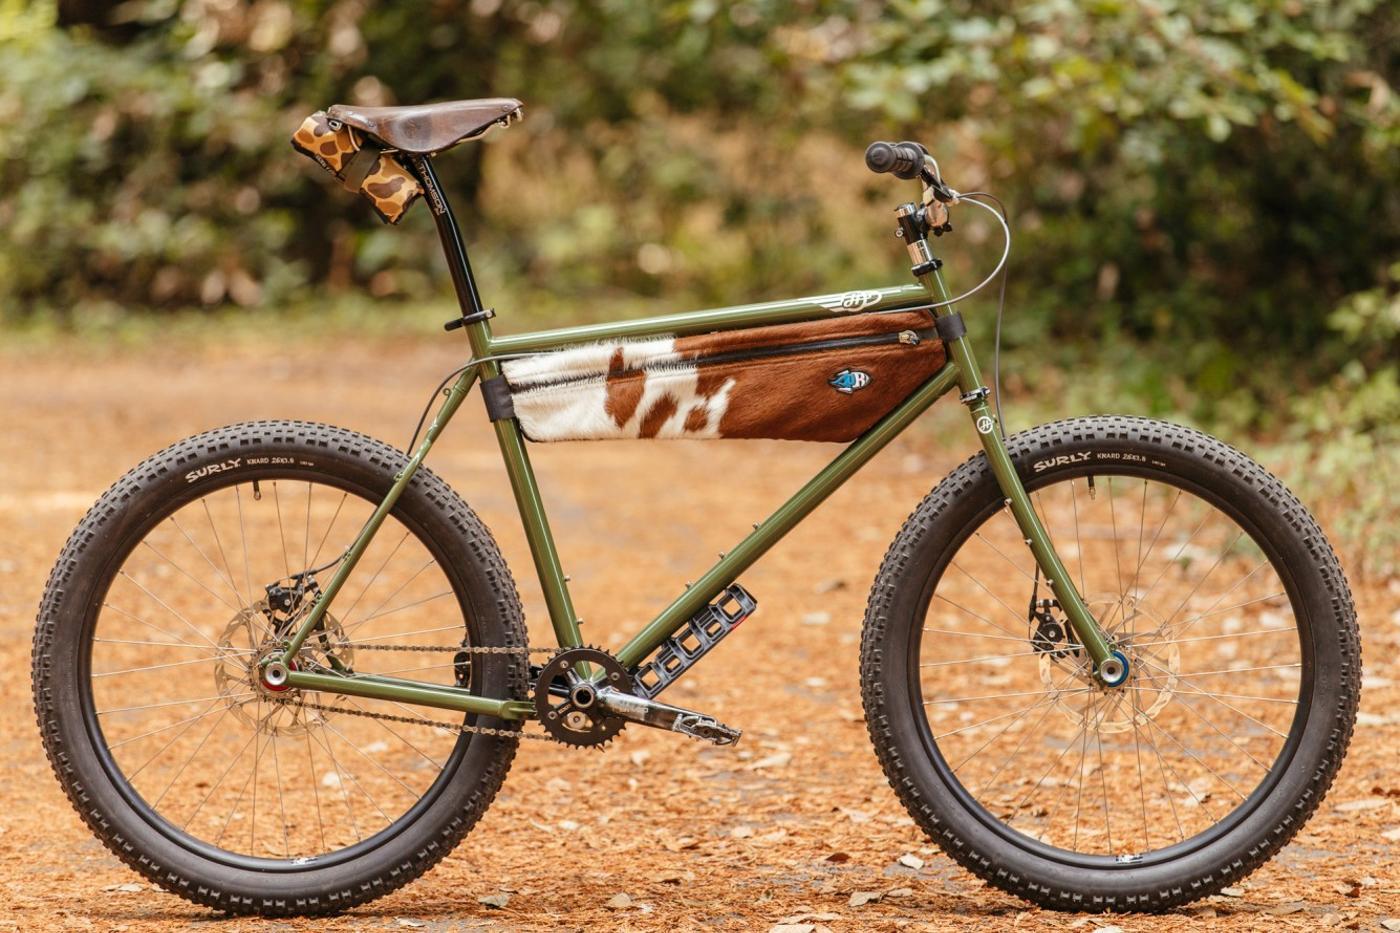 10-Hunter-Cycles-Bushmaster-Tourer-1-1335x890